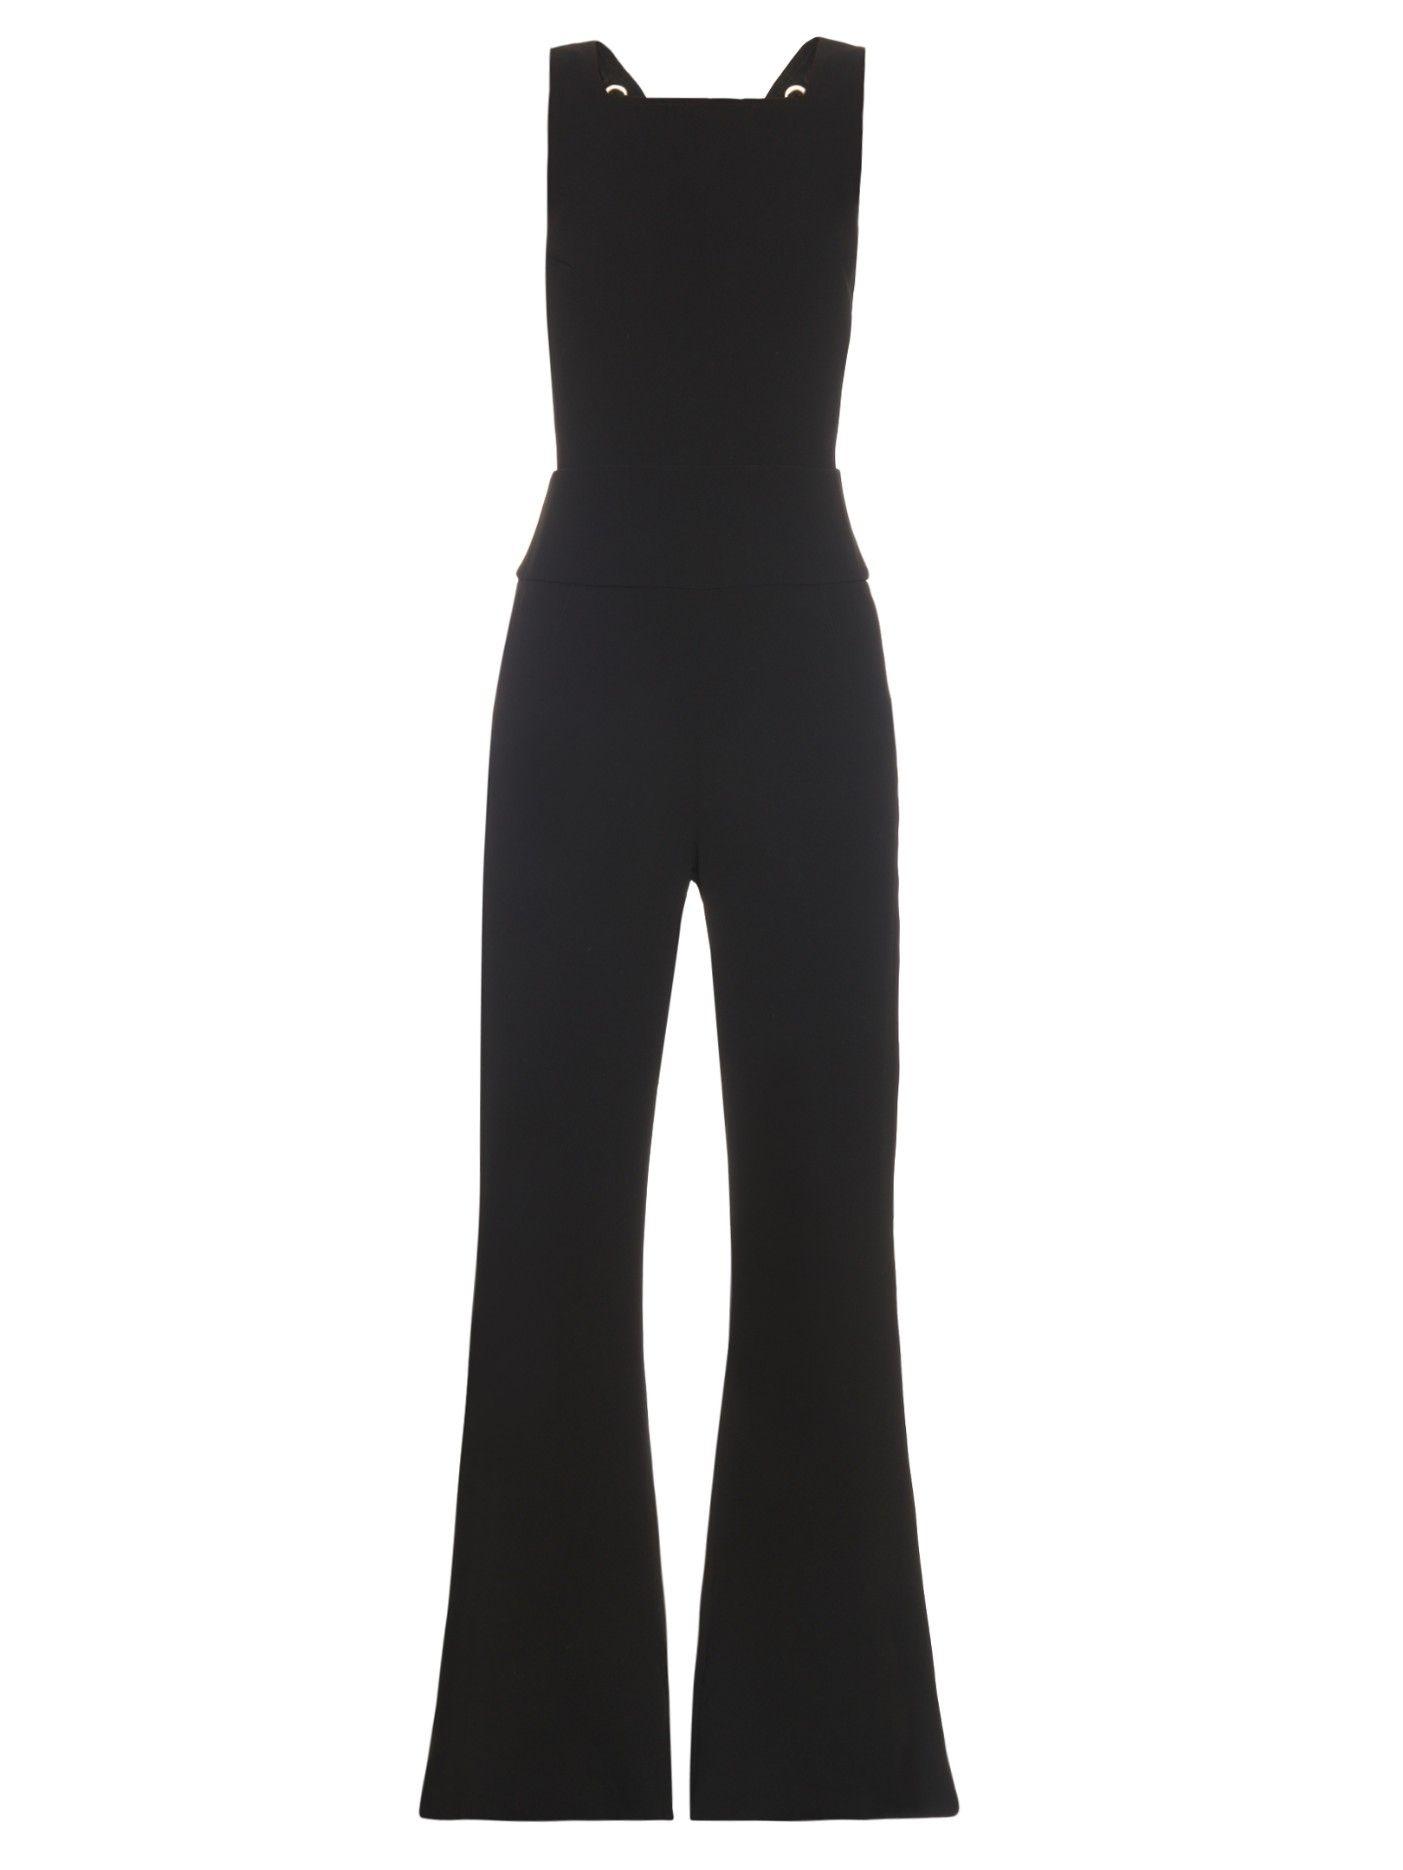 Placido jumpsuit | Max Mara | MATCHESFASHION.COM US